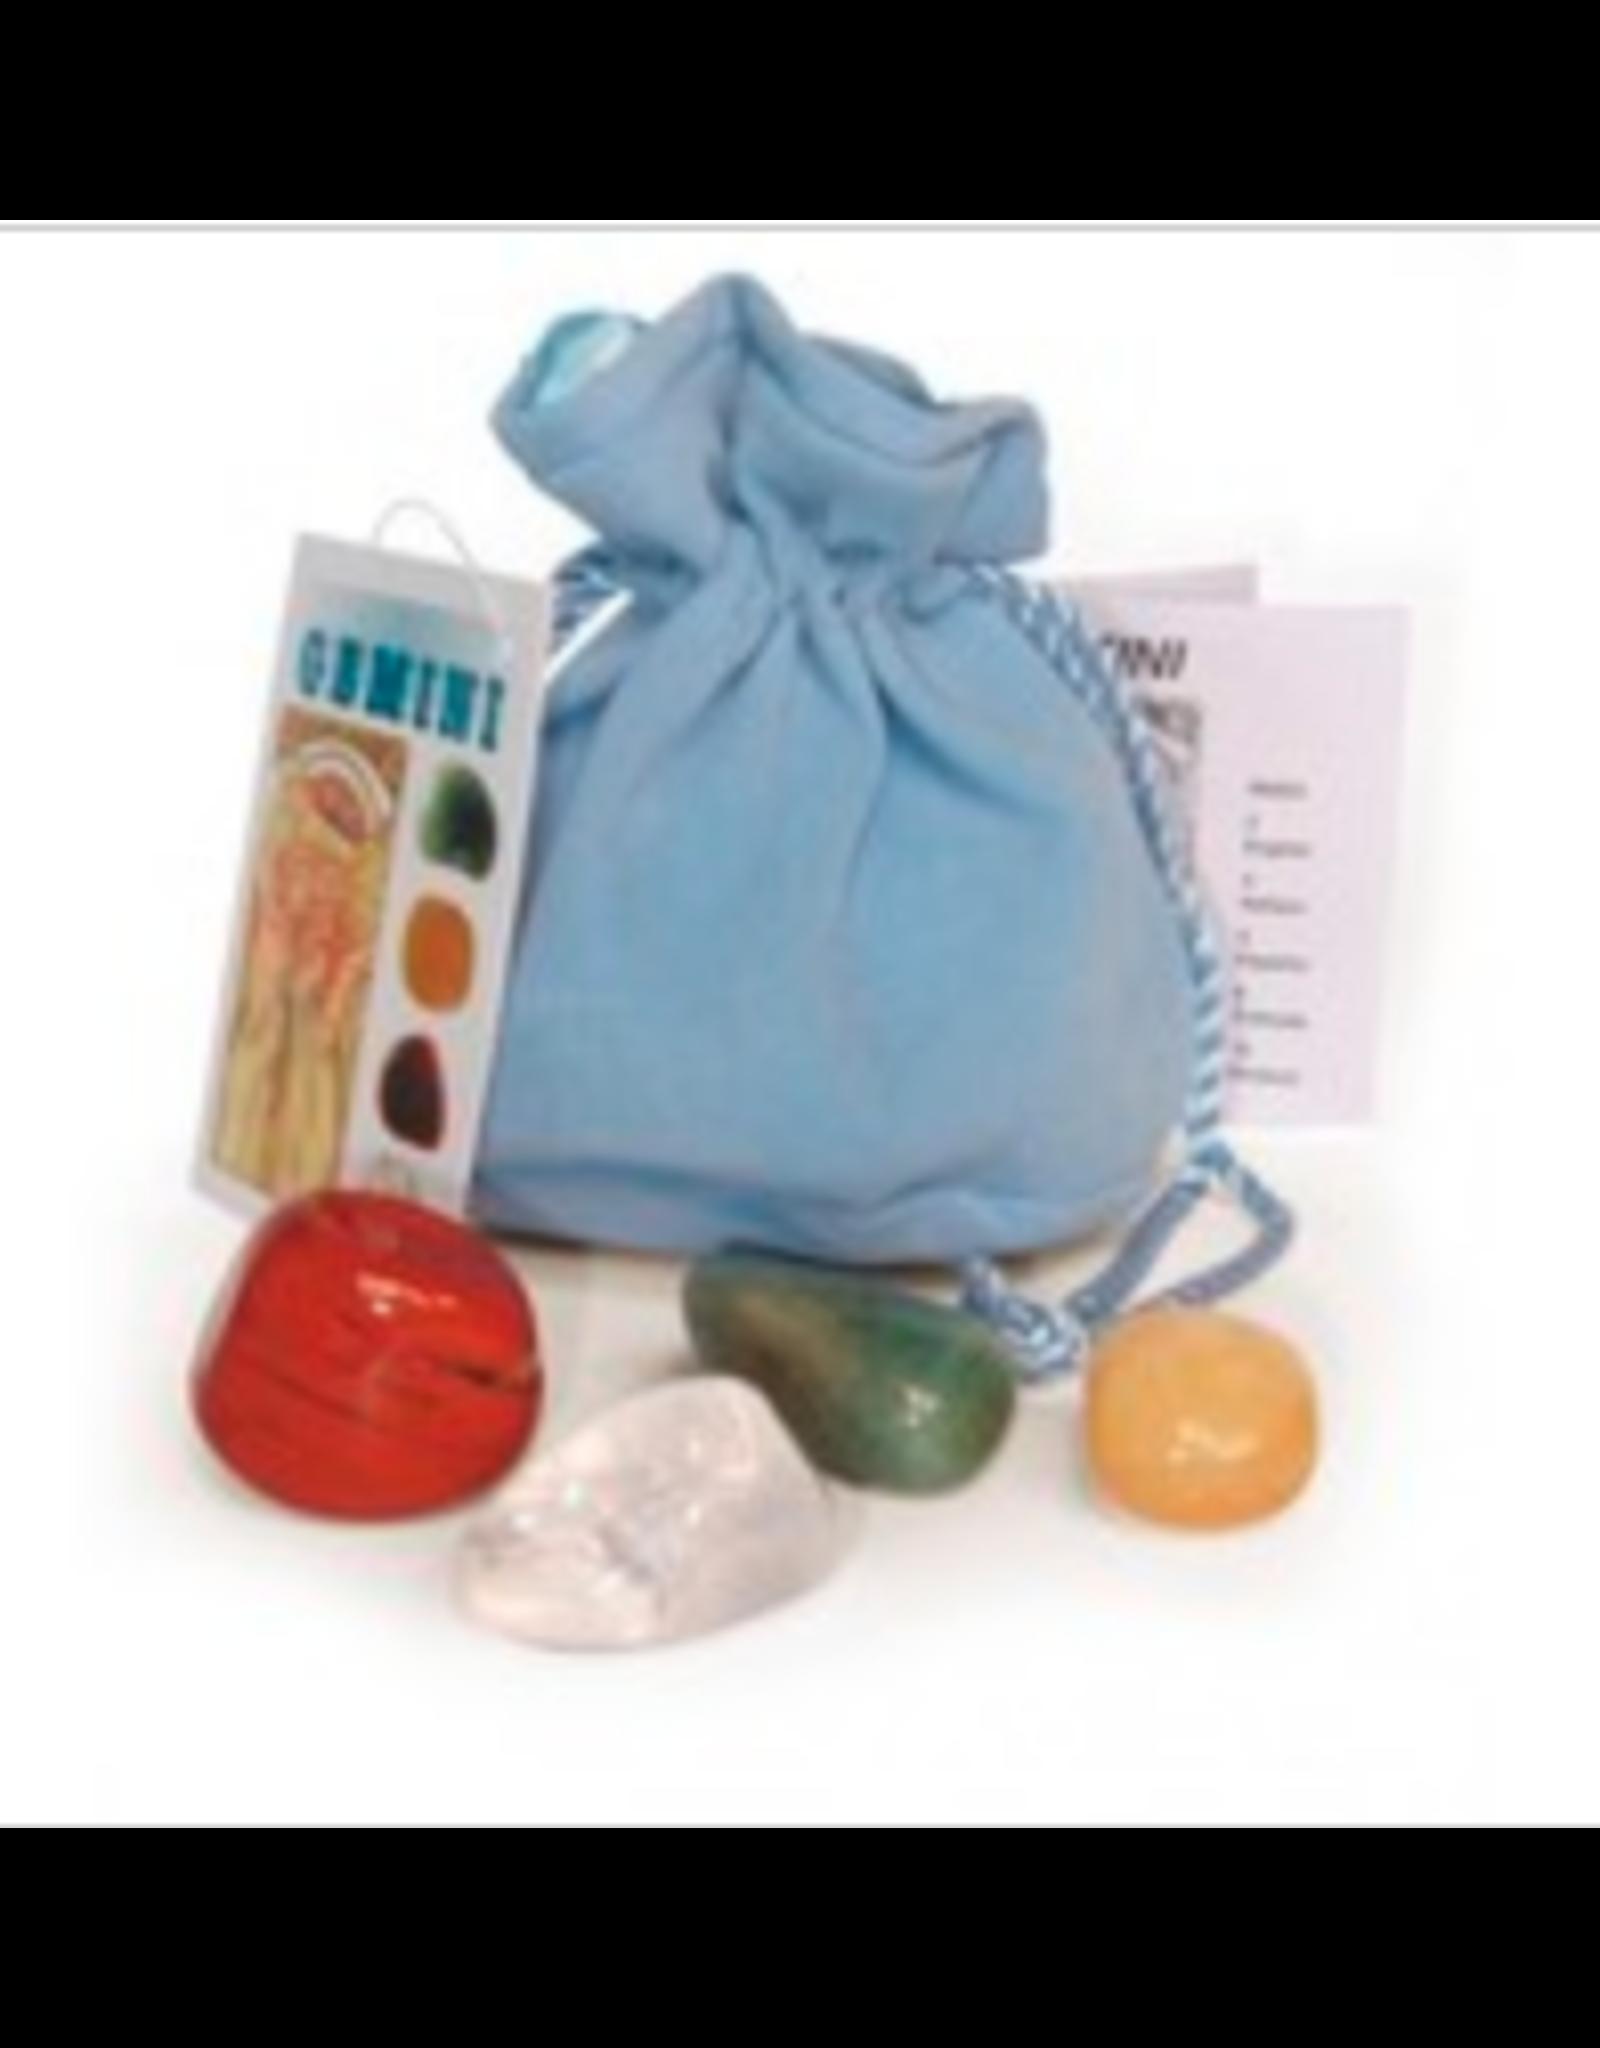 Gemini Astrological Crystal Kit